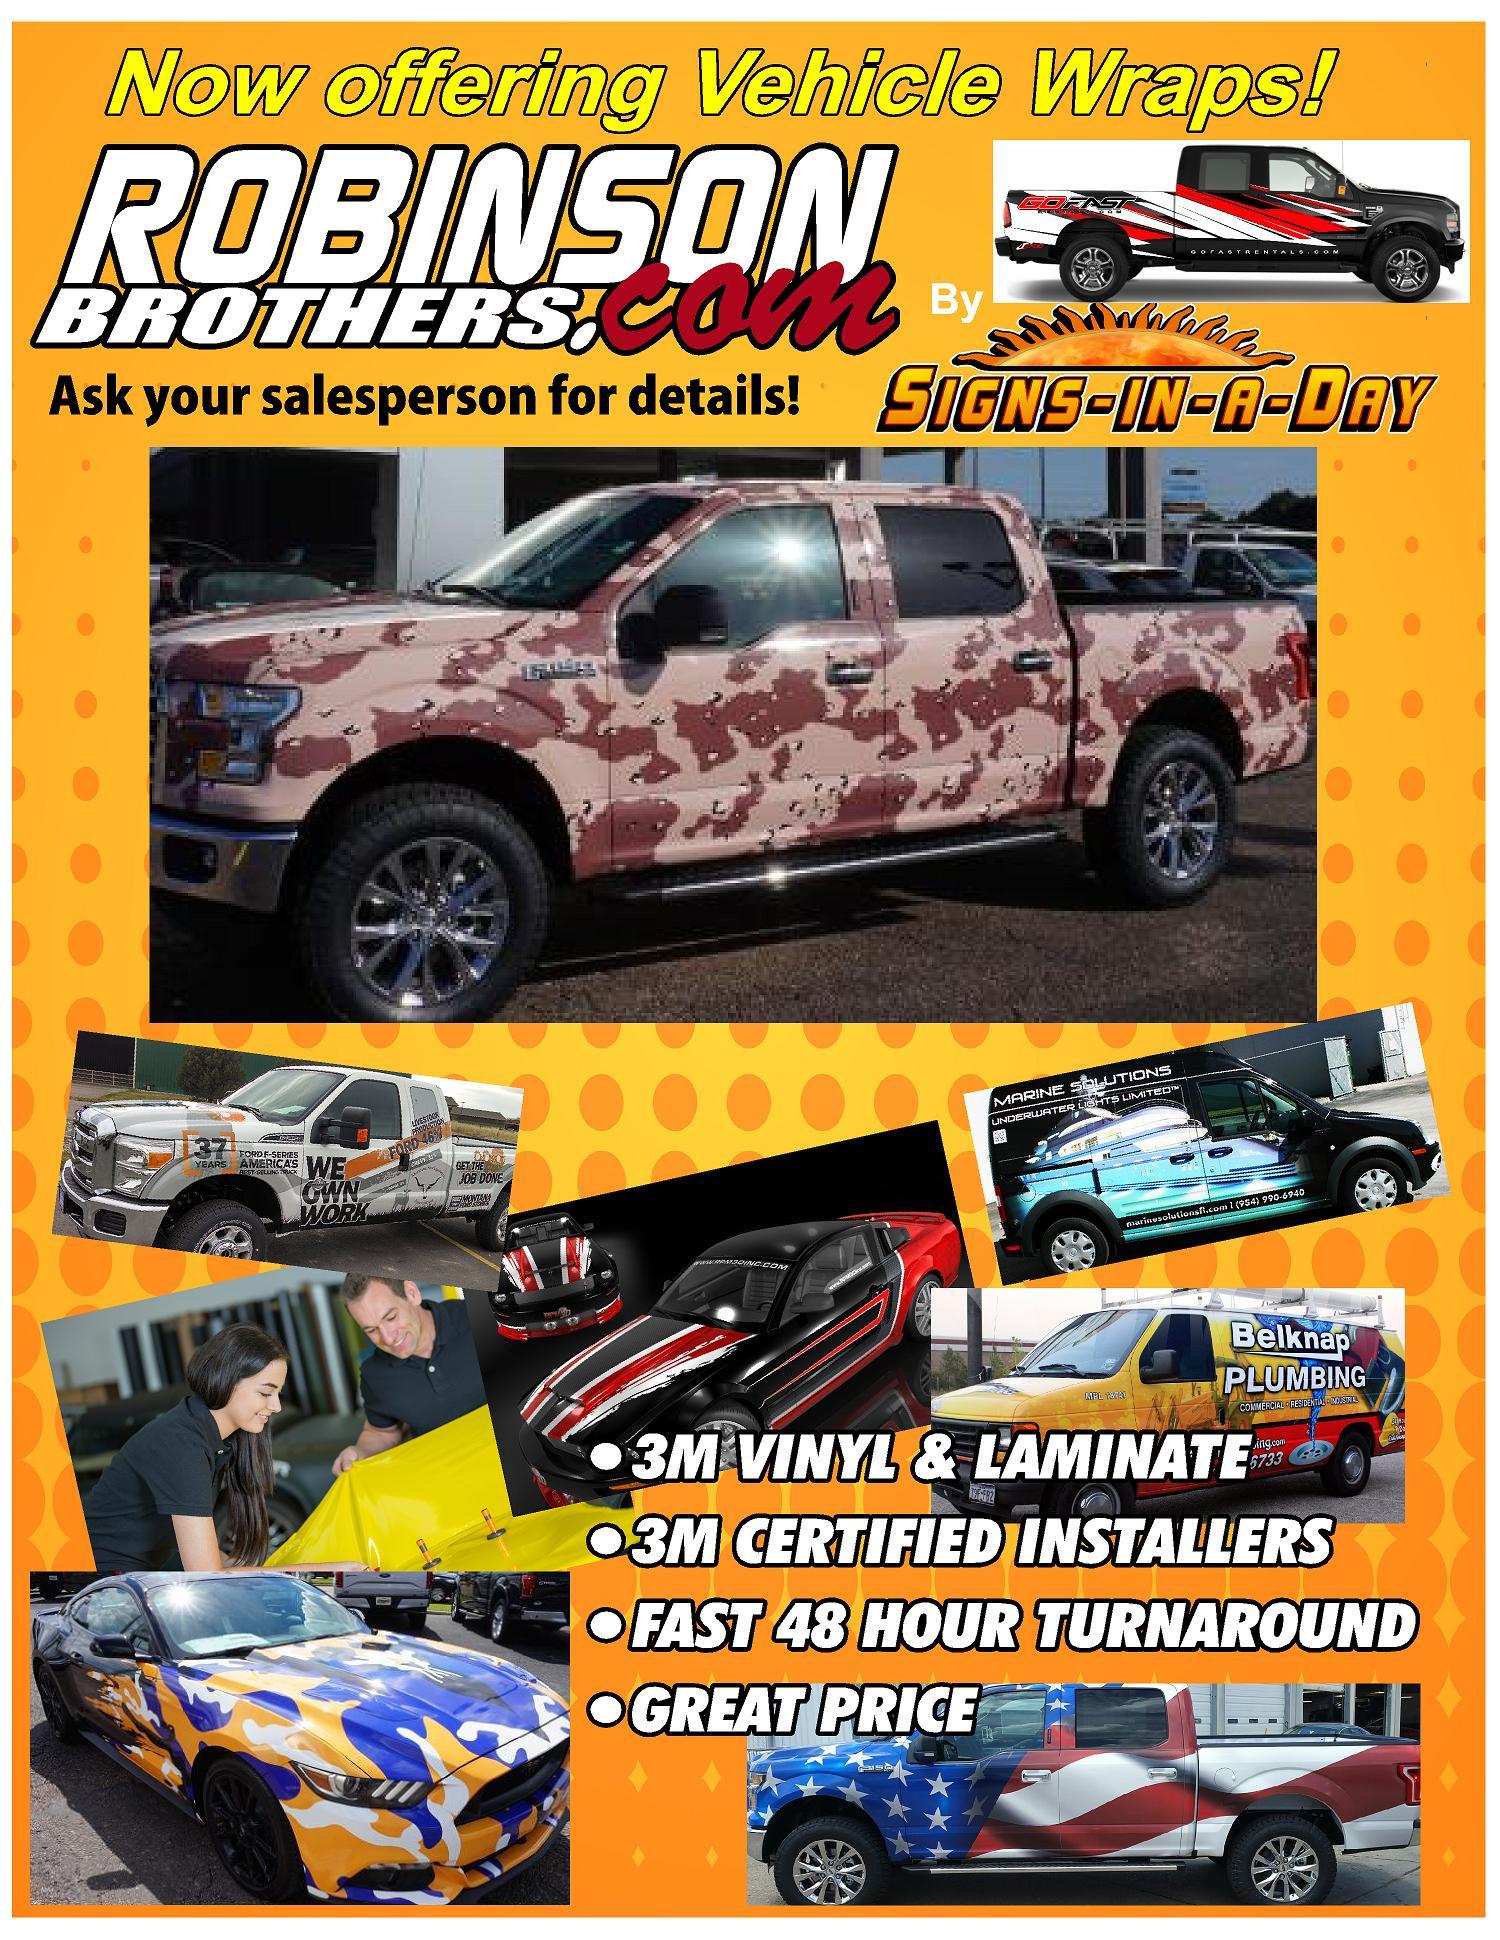 Custom Vinyl and Laminate Vehicle Wraps